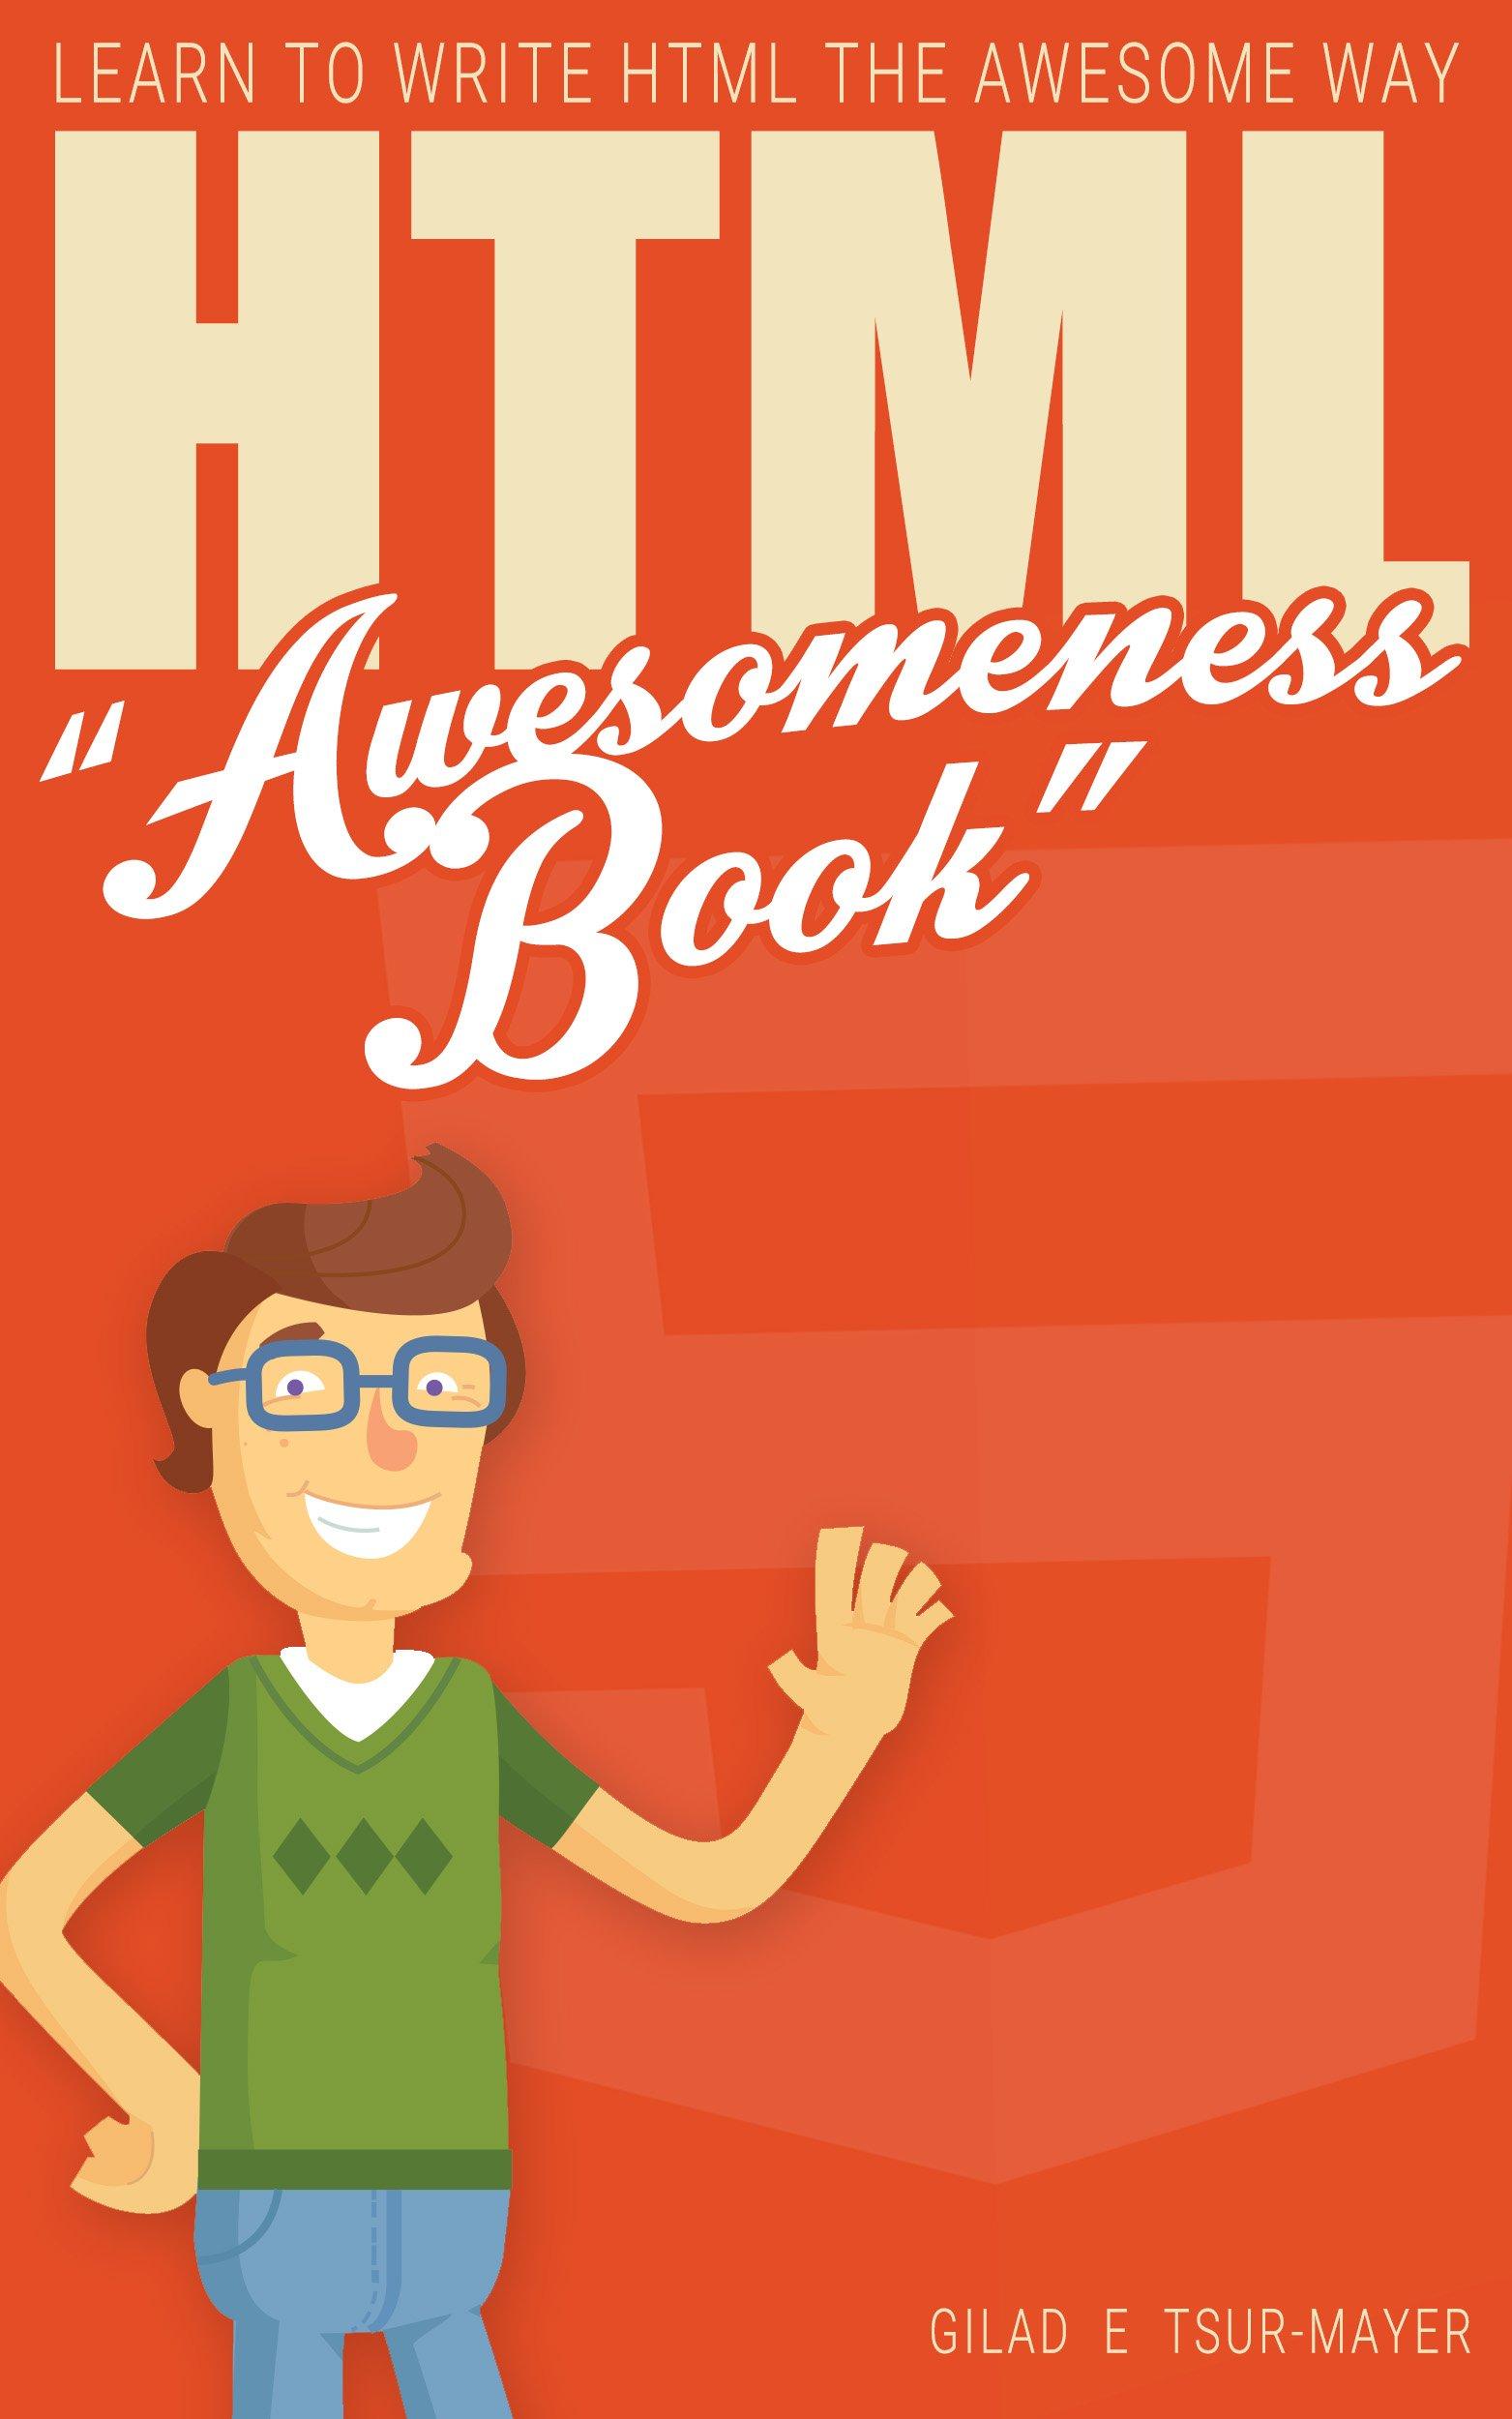 HTML: HTML Awesomeness Book